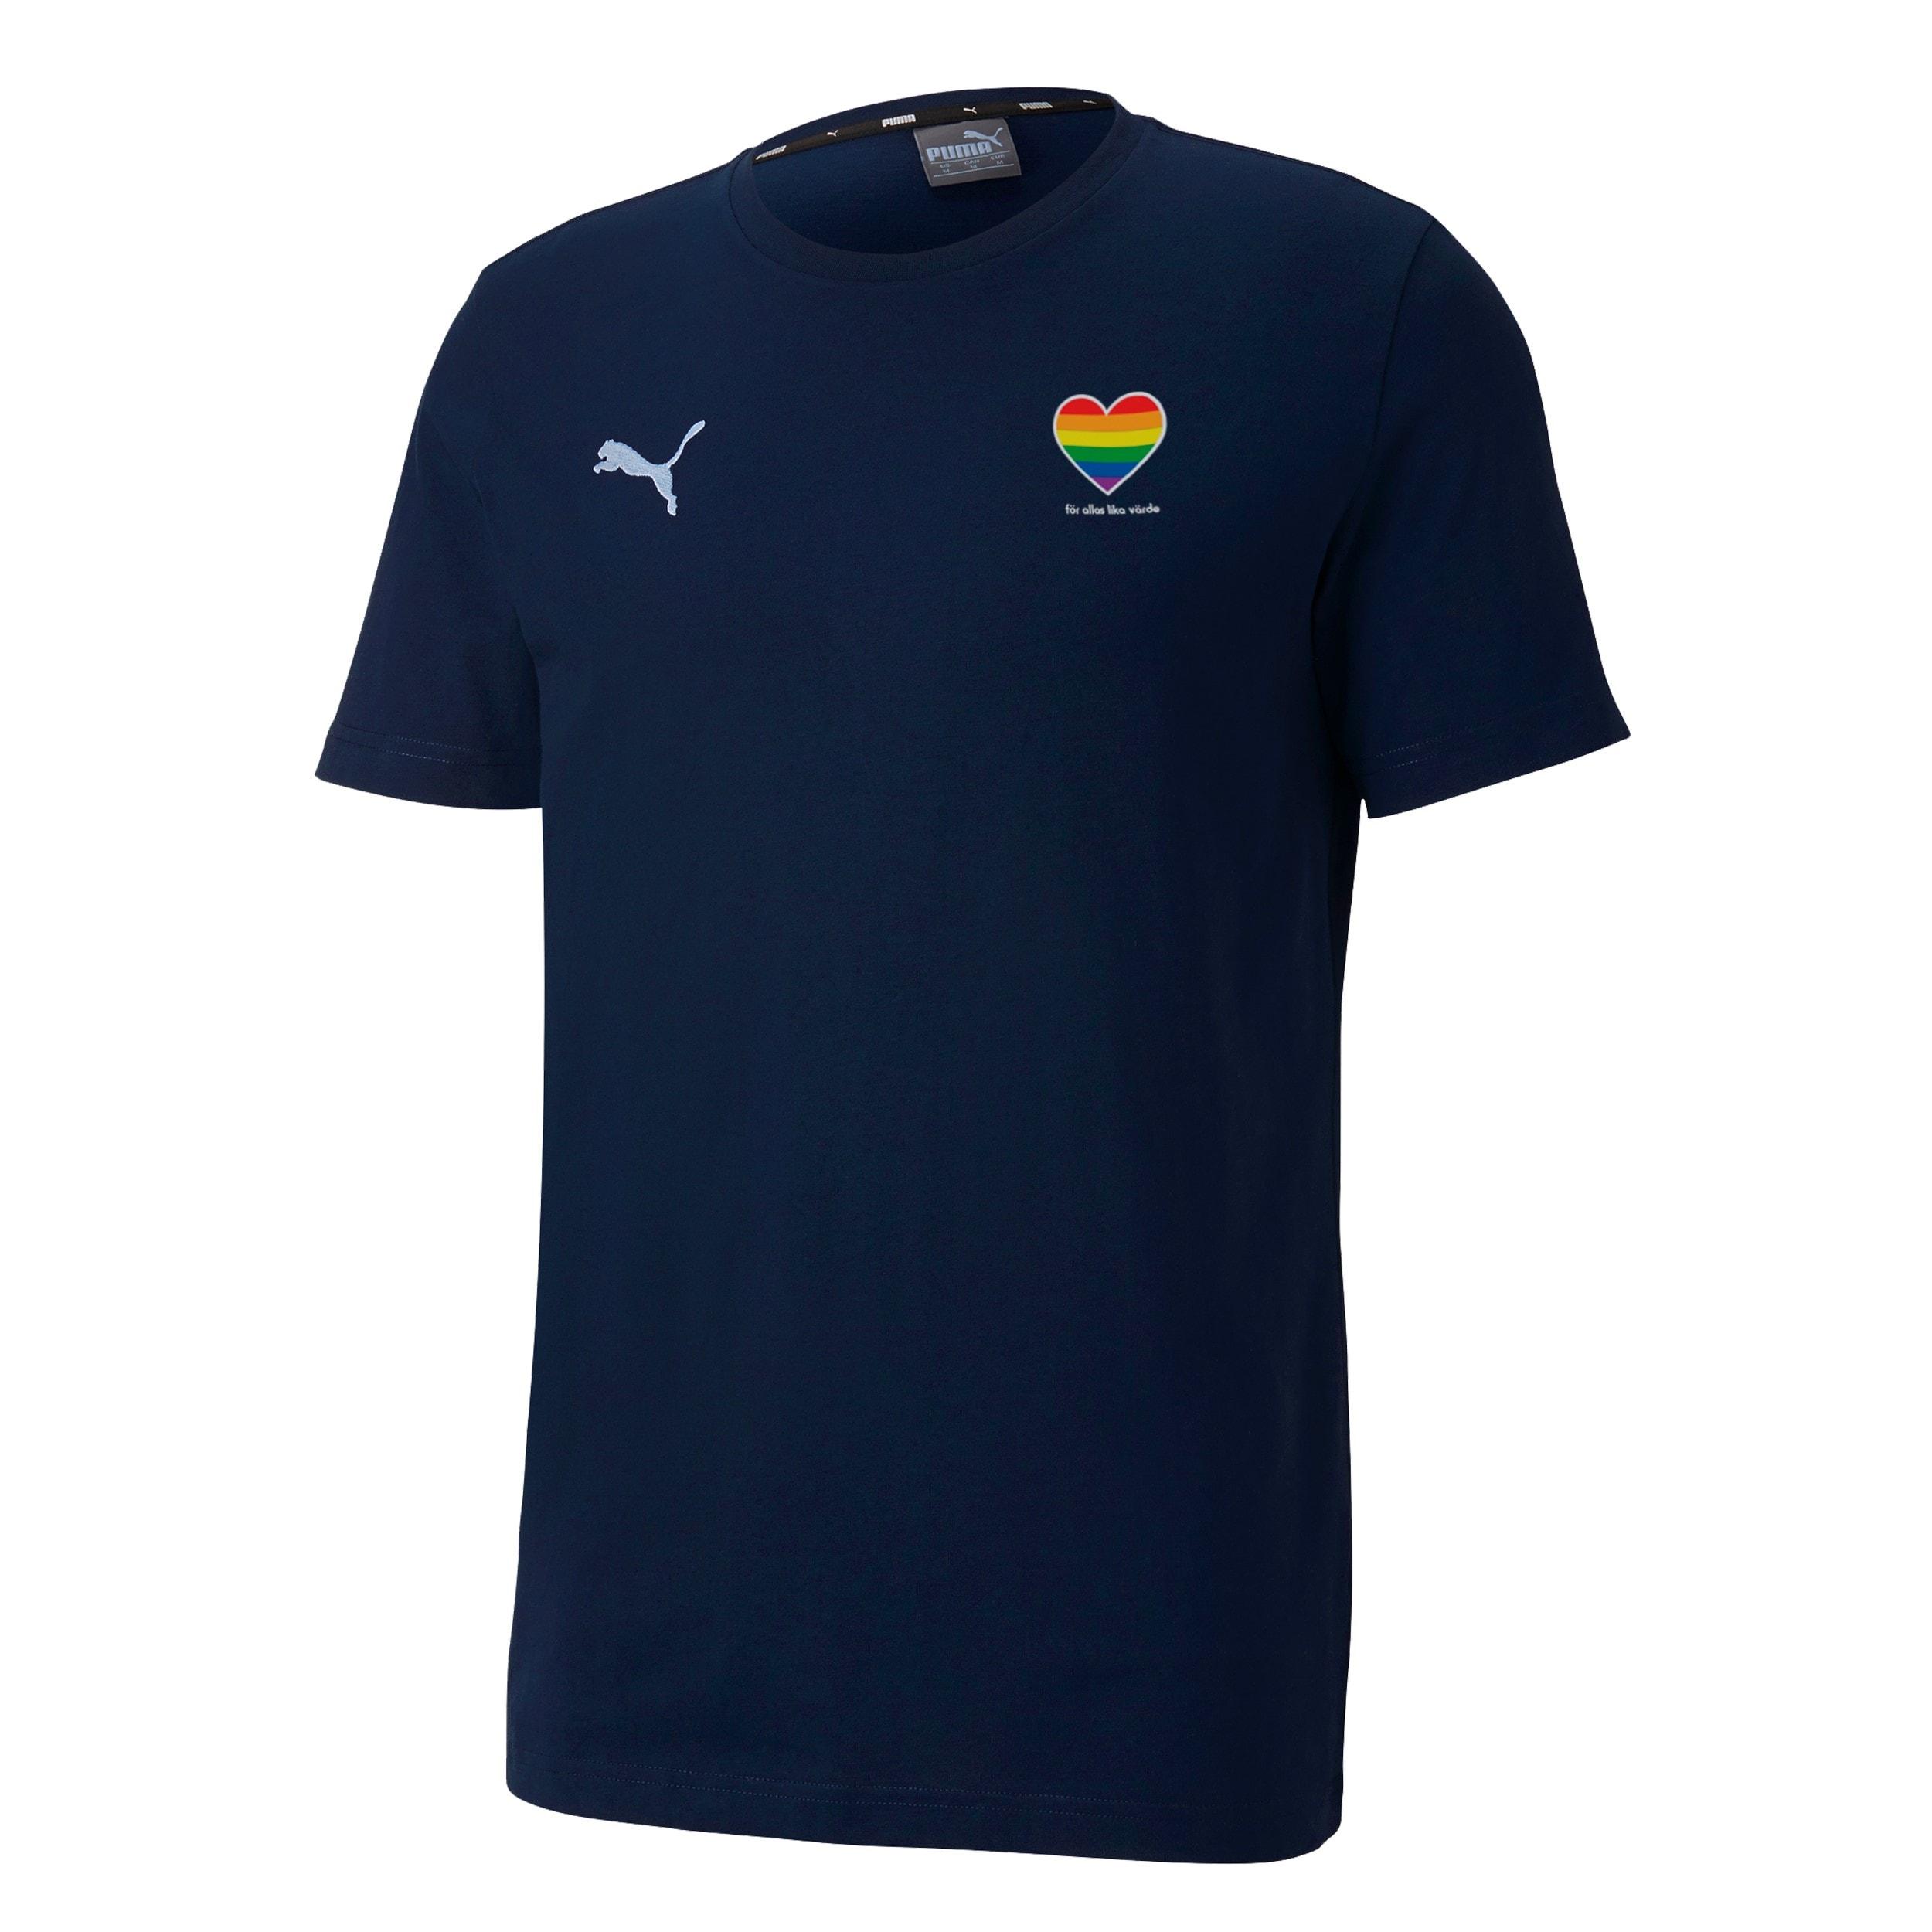 Puma t-shirt marin pride hjärta